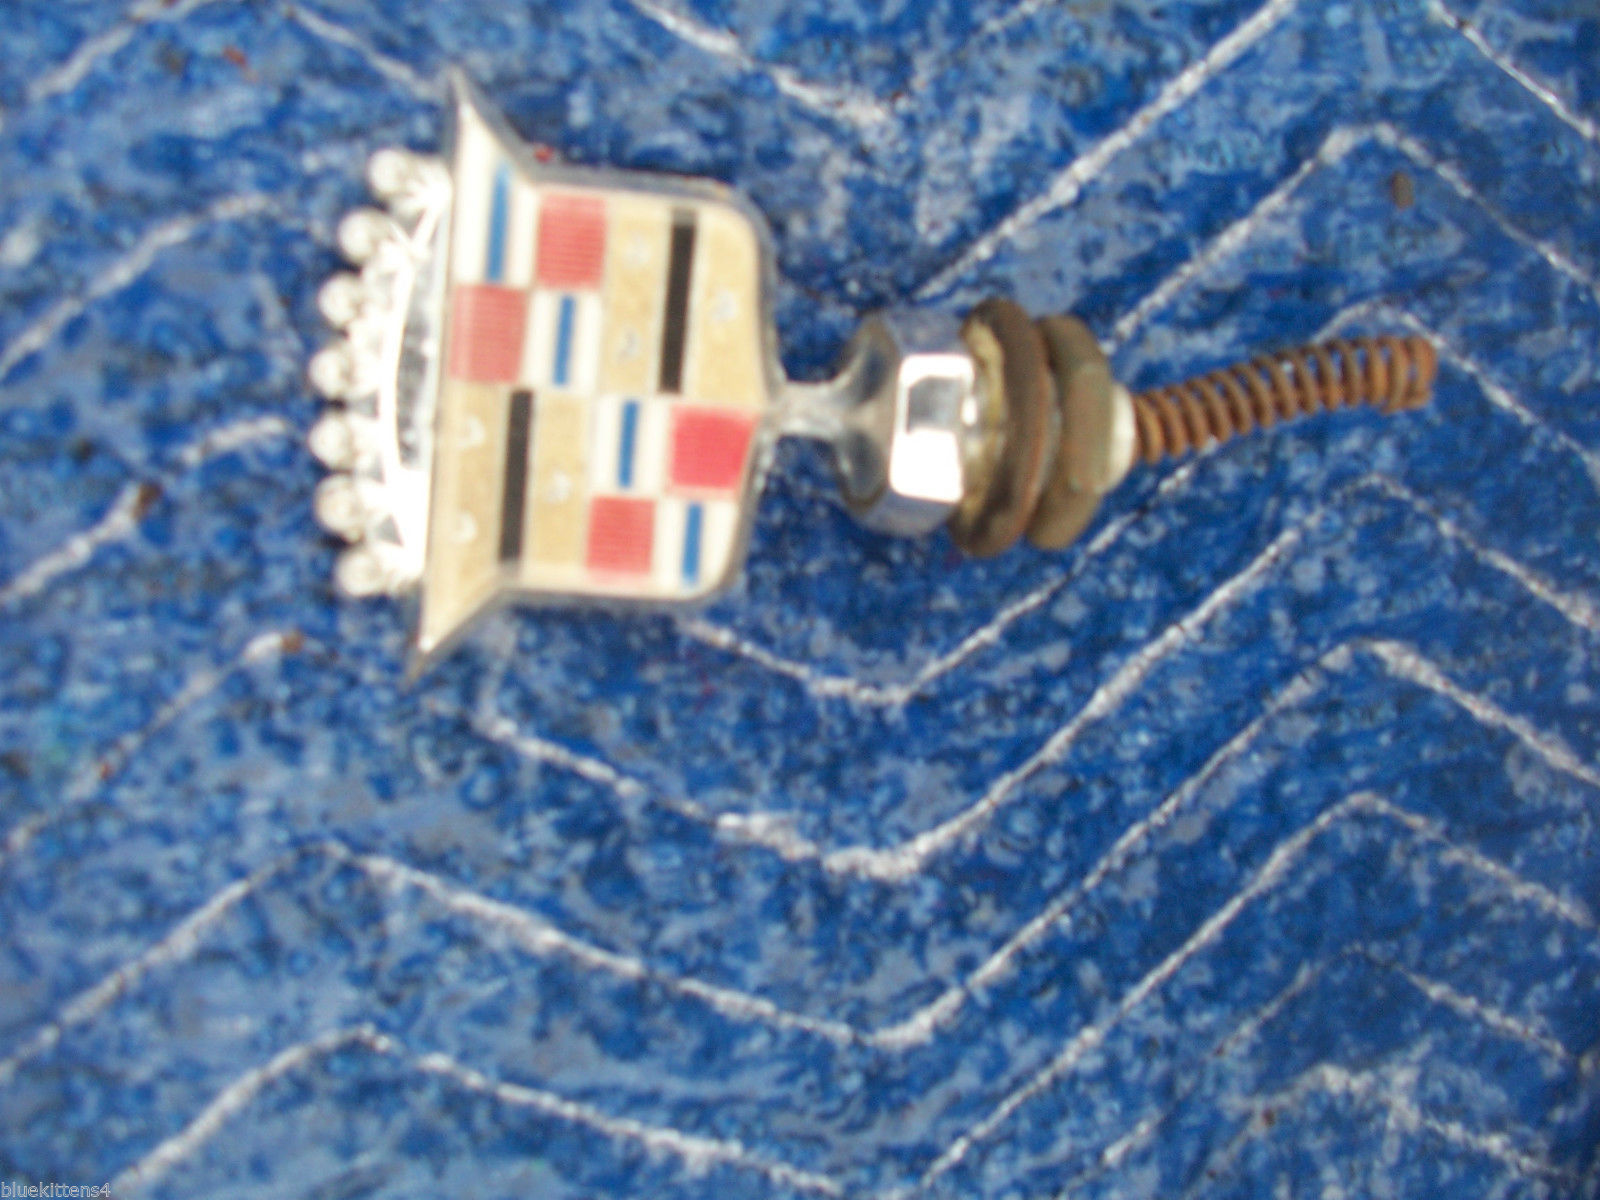 1979 COUPE DEVILLE HOOD ORNAMENT EMBLEM OEM USED GENUINE GM CADILLAC PART 1978 image 5